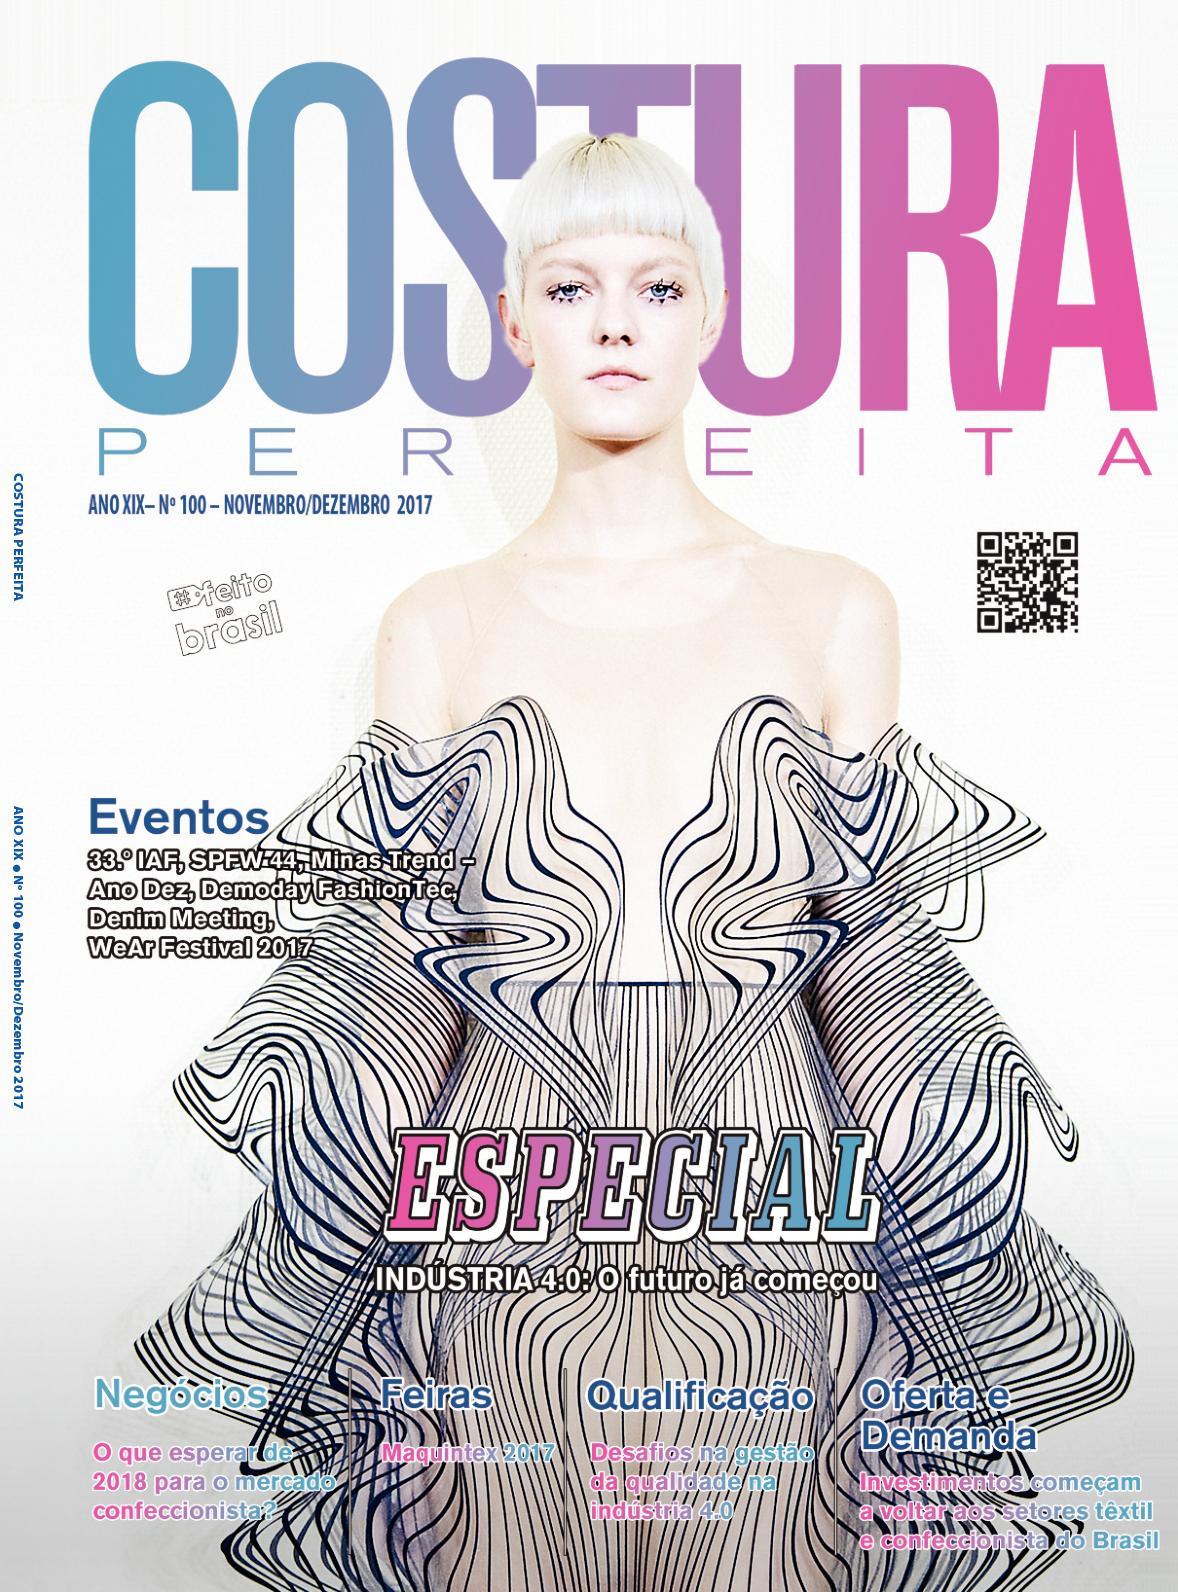 Calaméo - Revista Costura Perfeita Edição Ano XIX - N100 - Novembro -  Dezembro 2017 536c50f8ba9ef